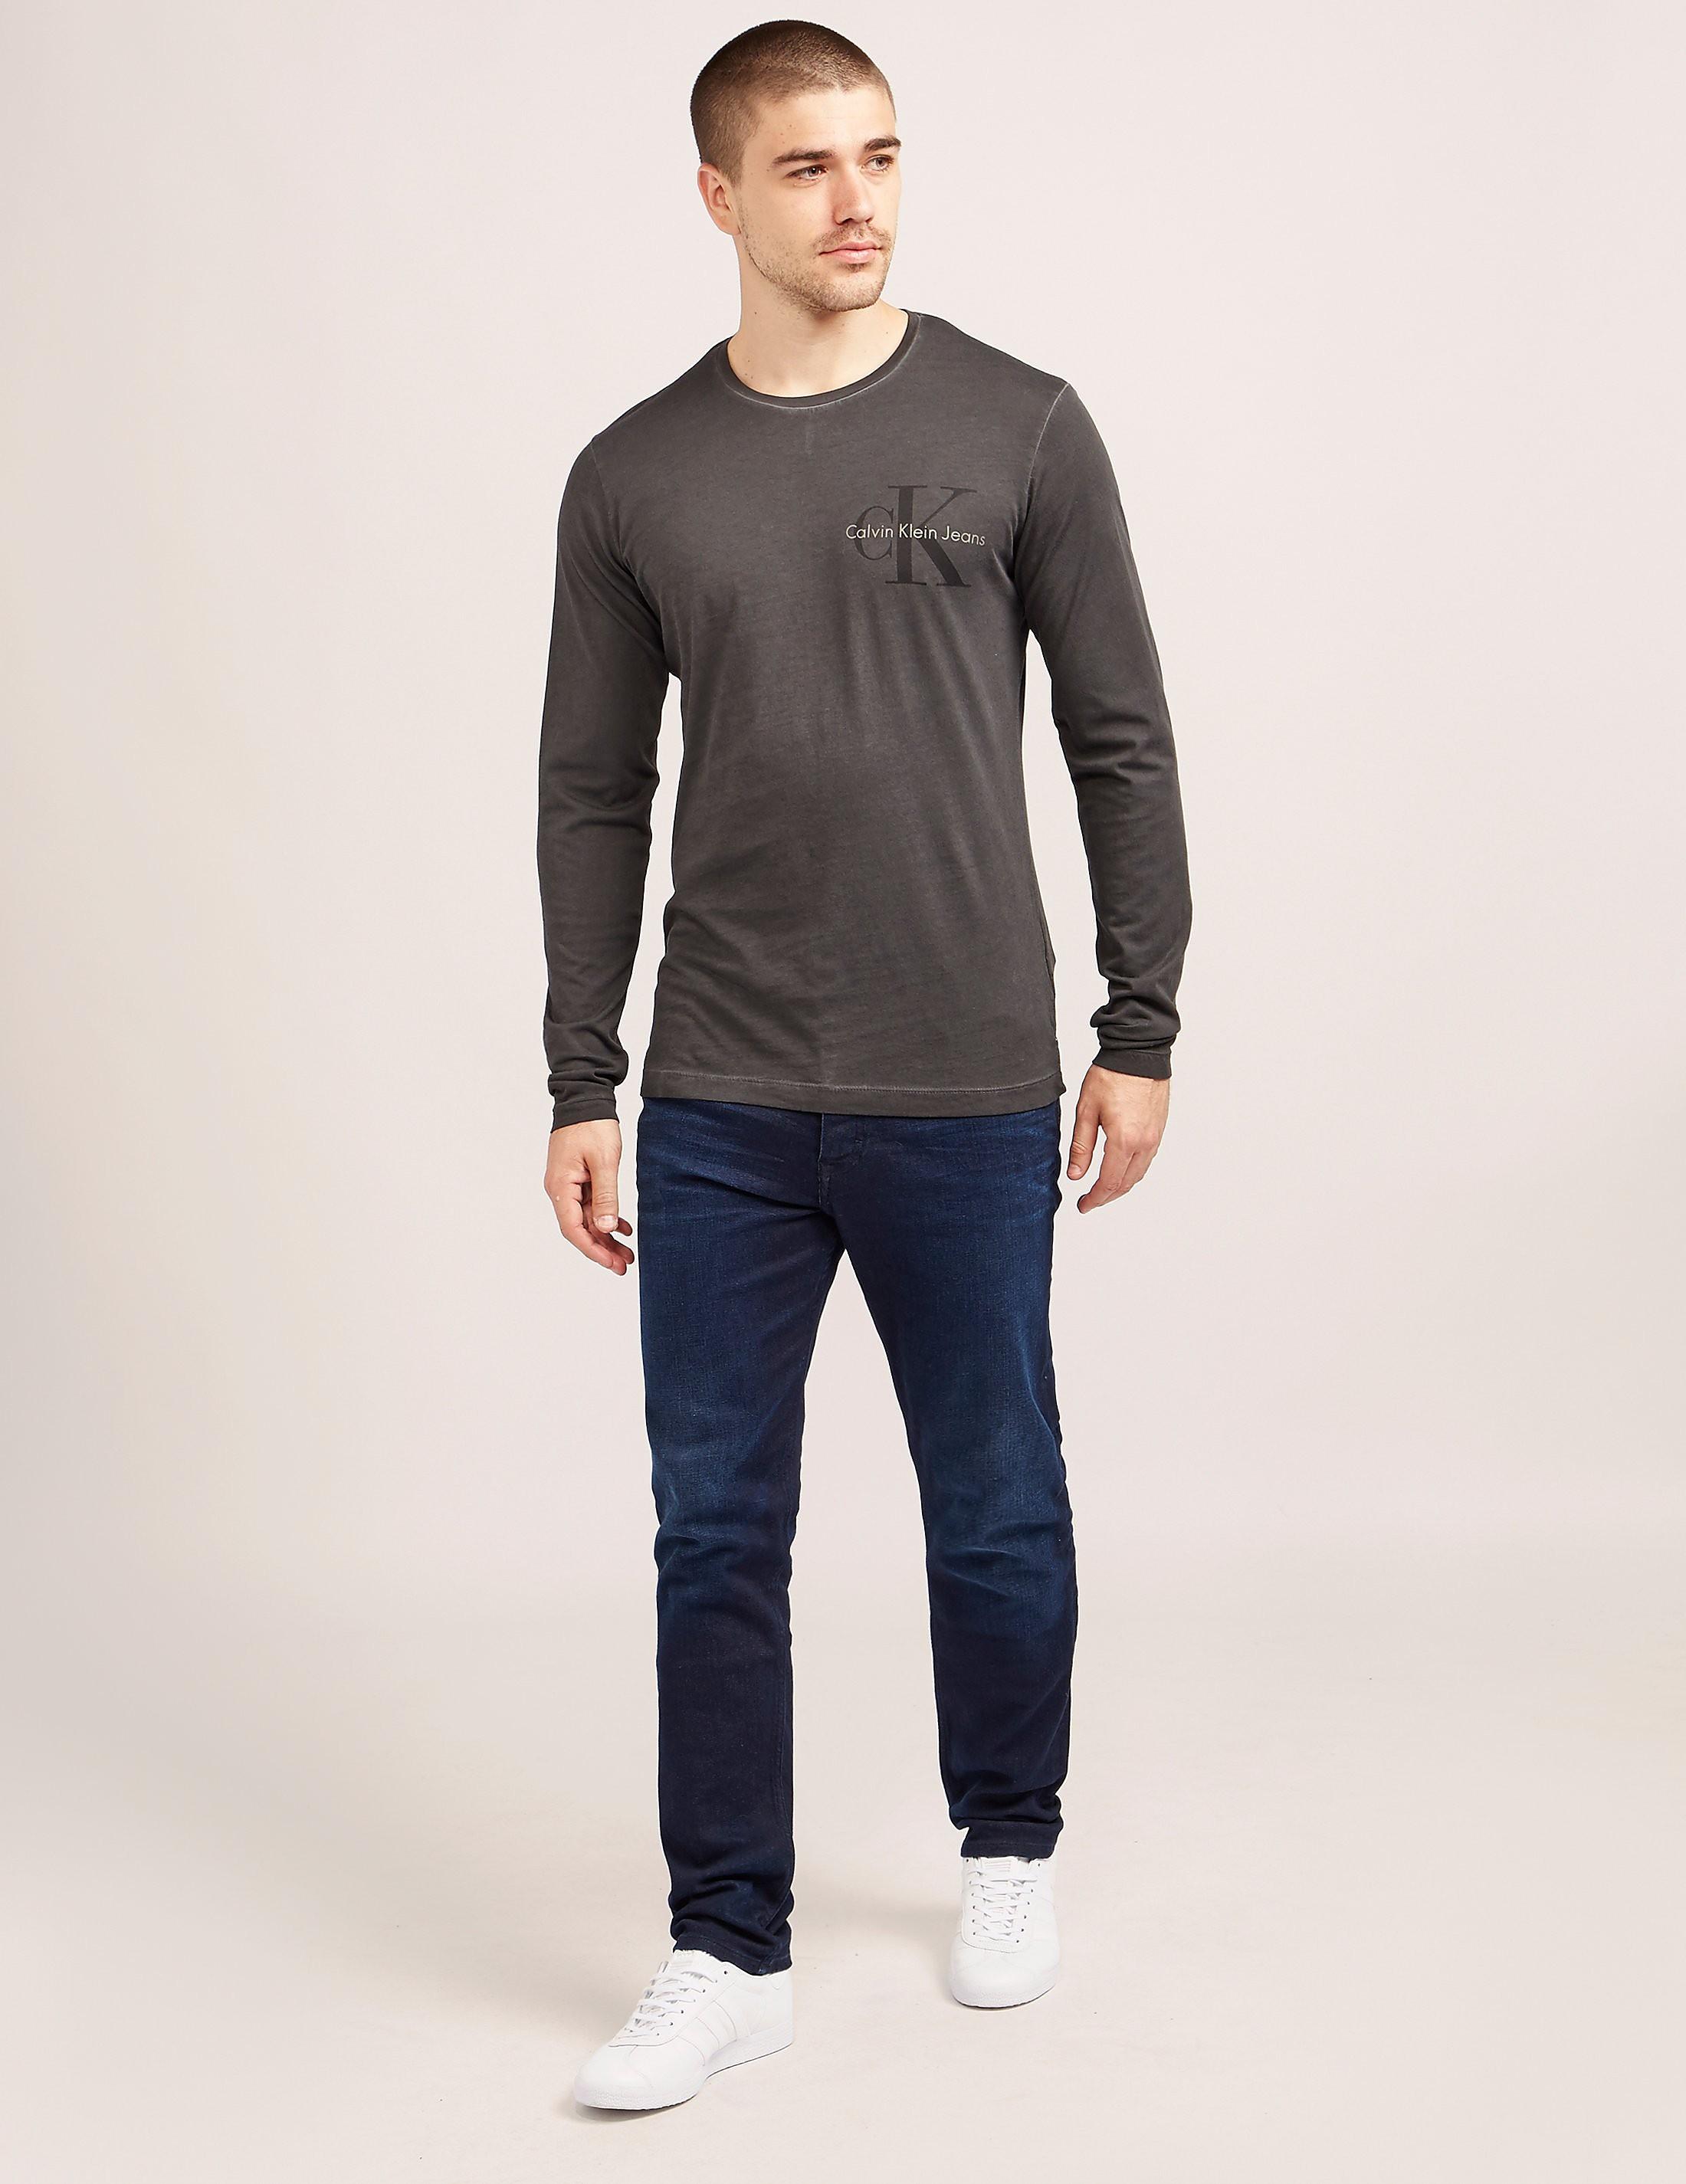 Calvin Klein Tribute 2 Long Sleeve T-Shirt